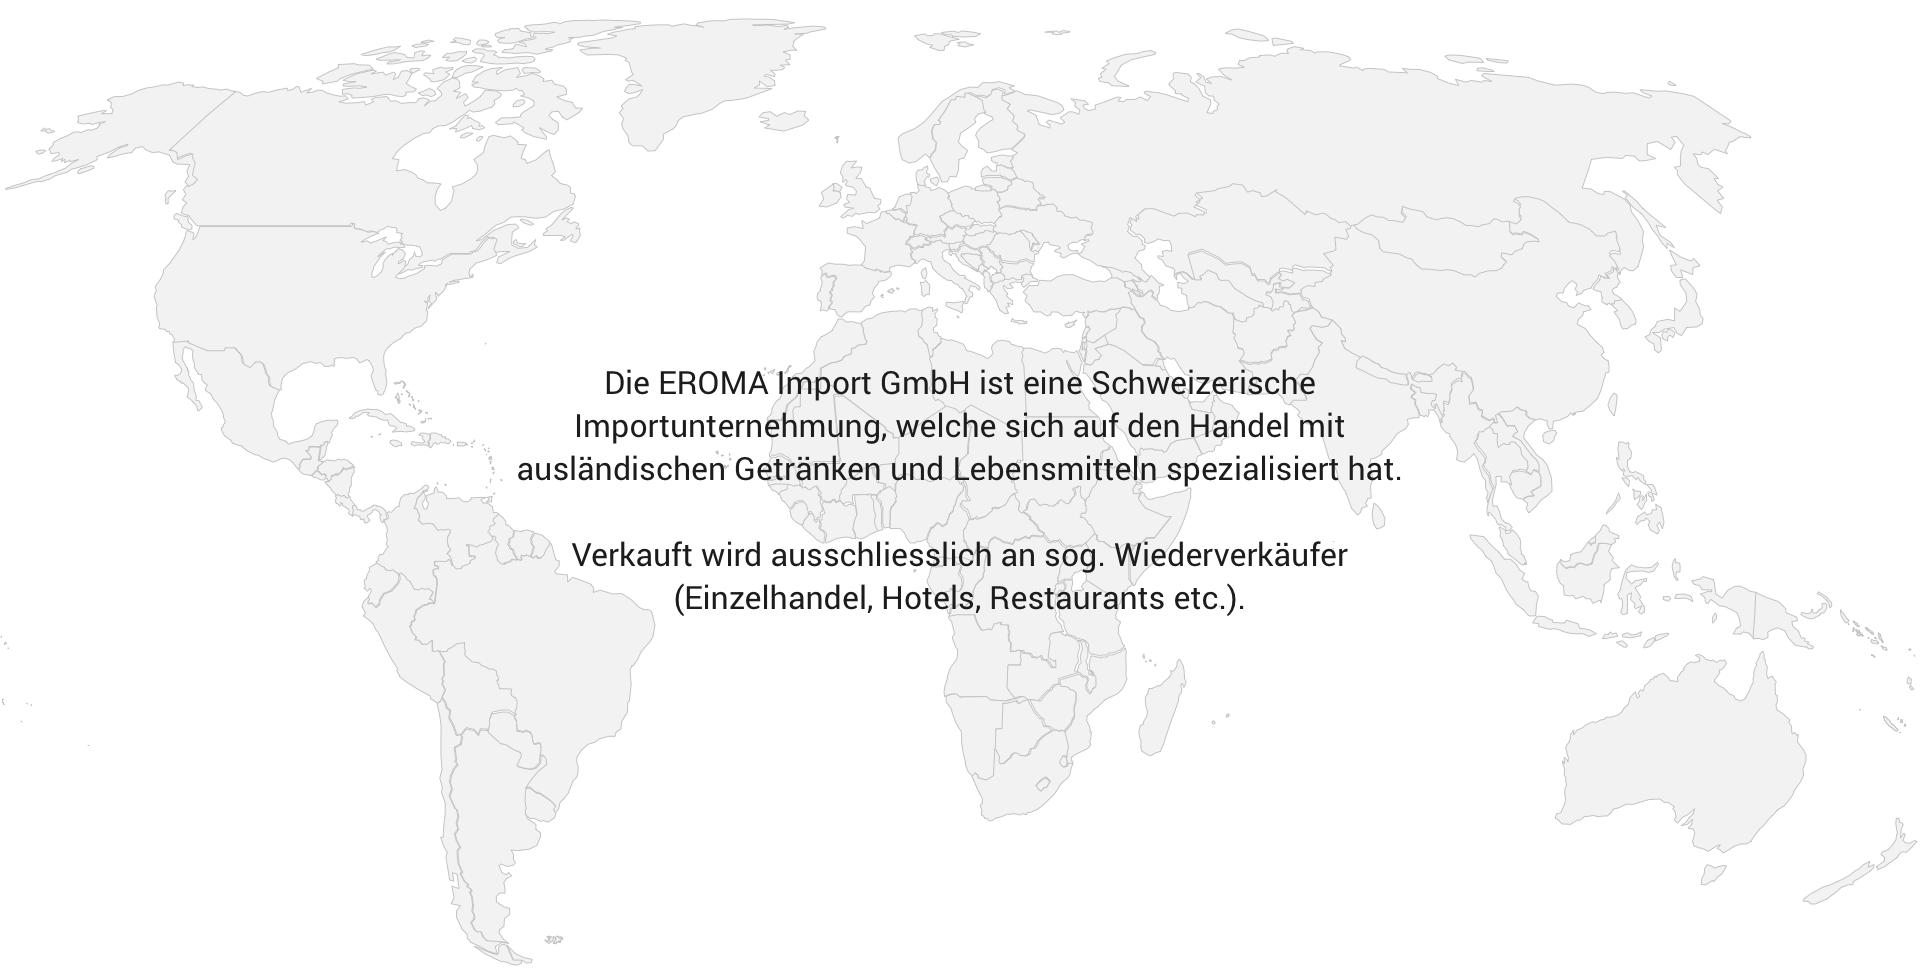 Unternehmen EROMA Import GmbH